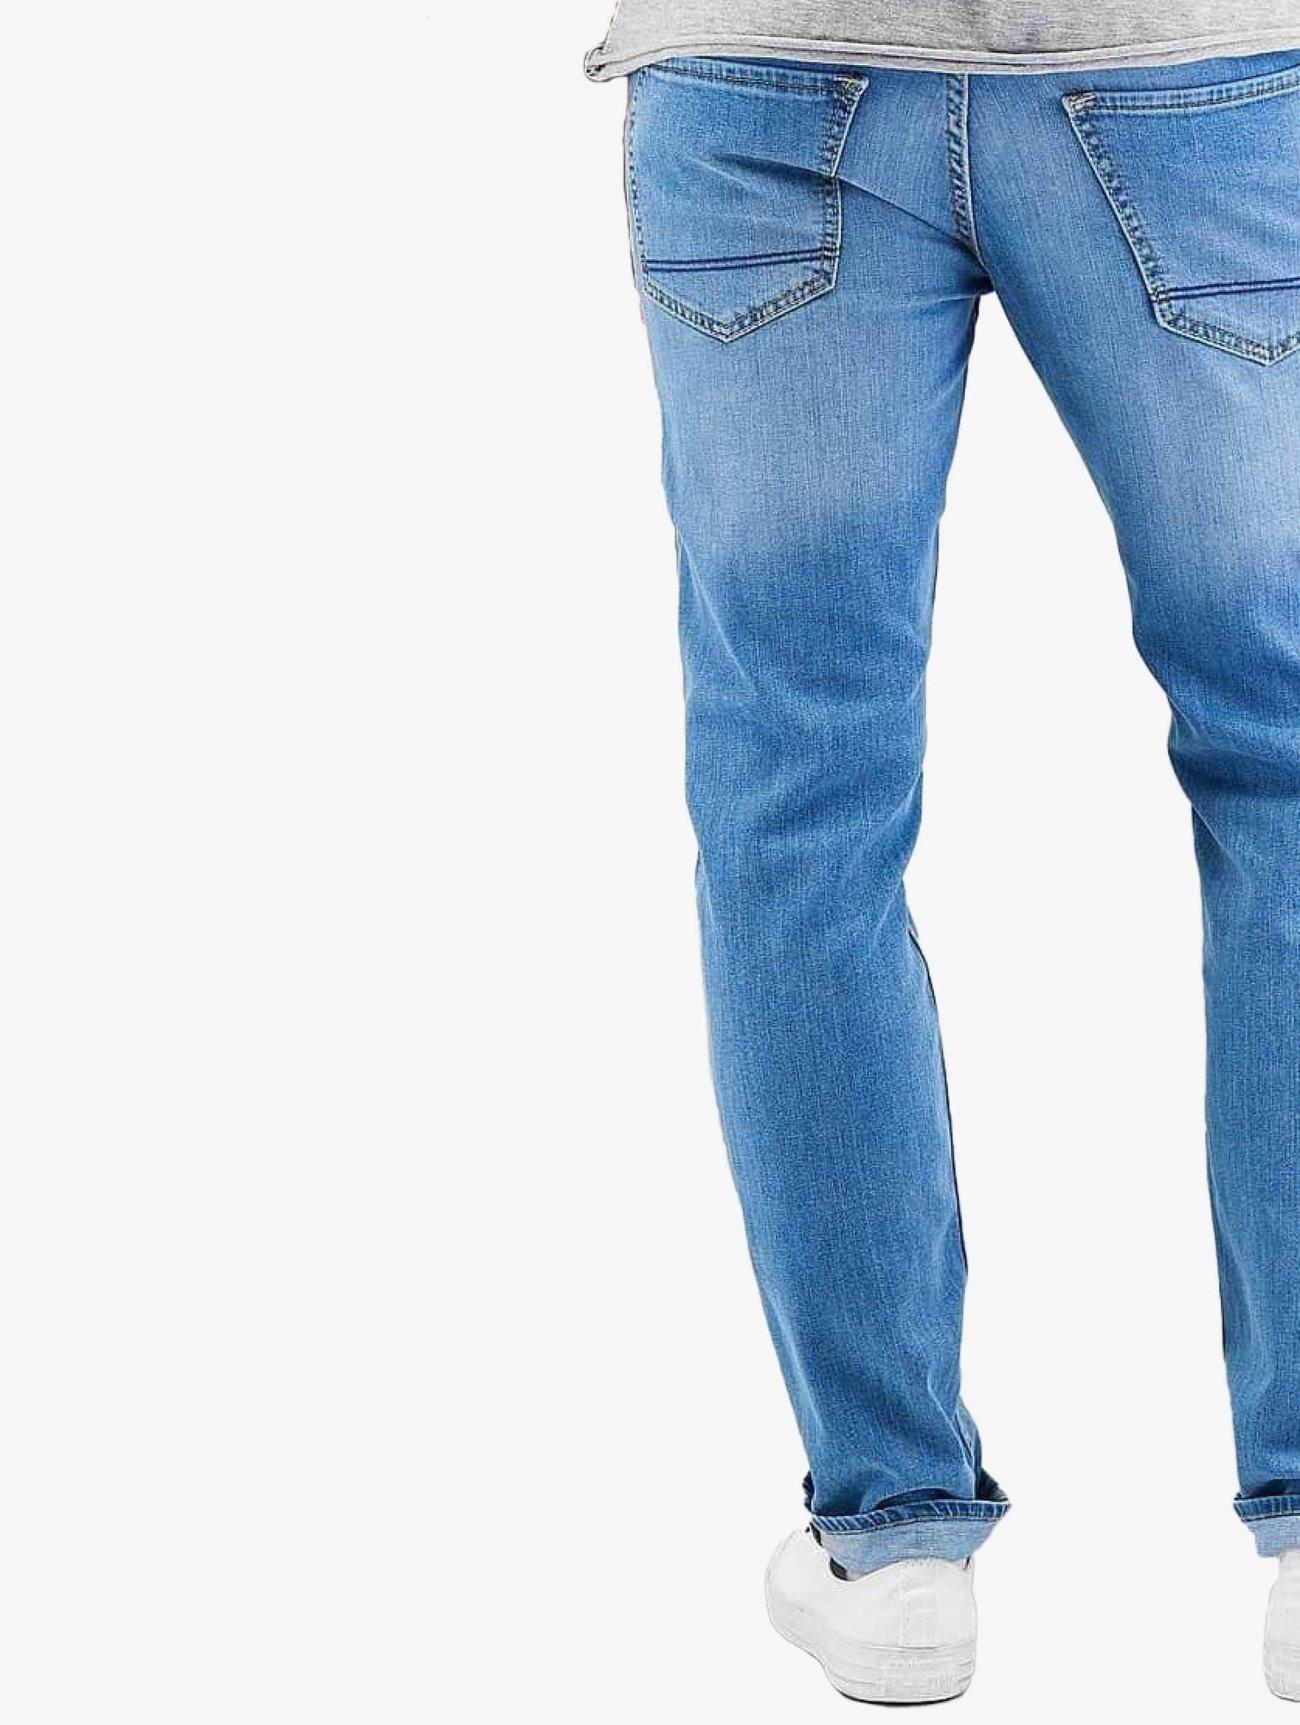 Reell Jeans  Nova II  bleu Homme Jean coupe droite  251001 Homme Jeans